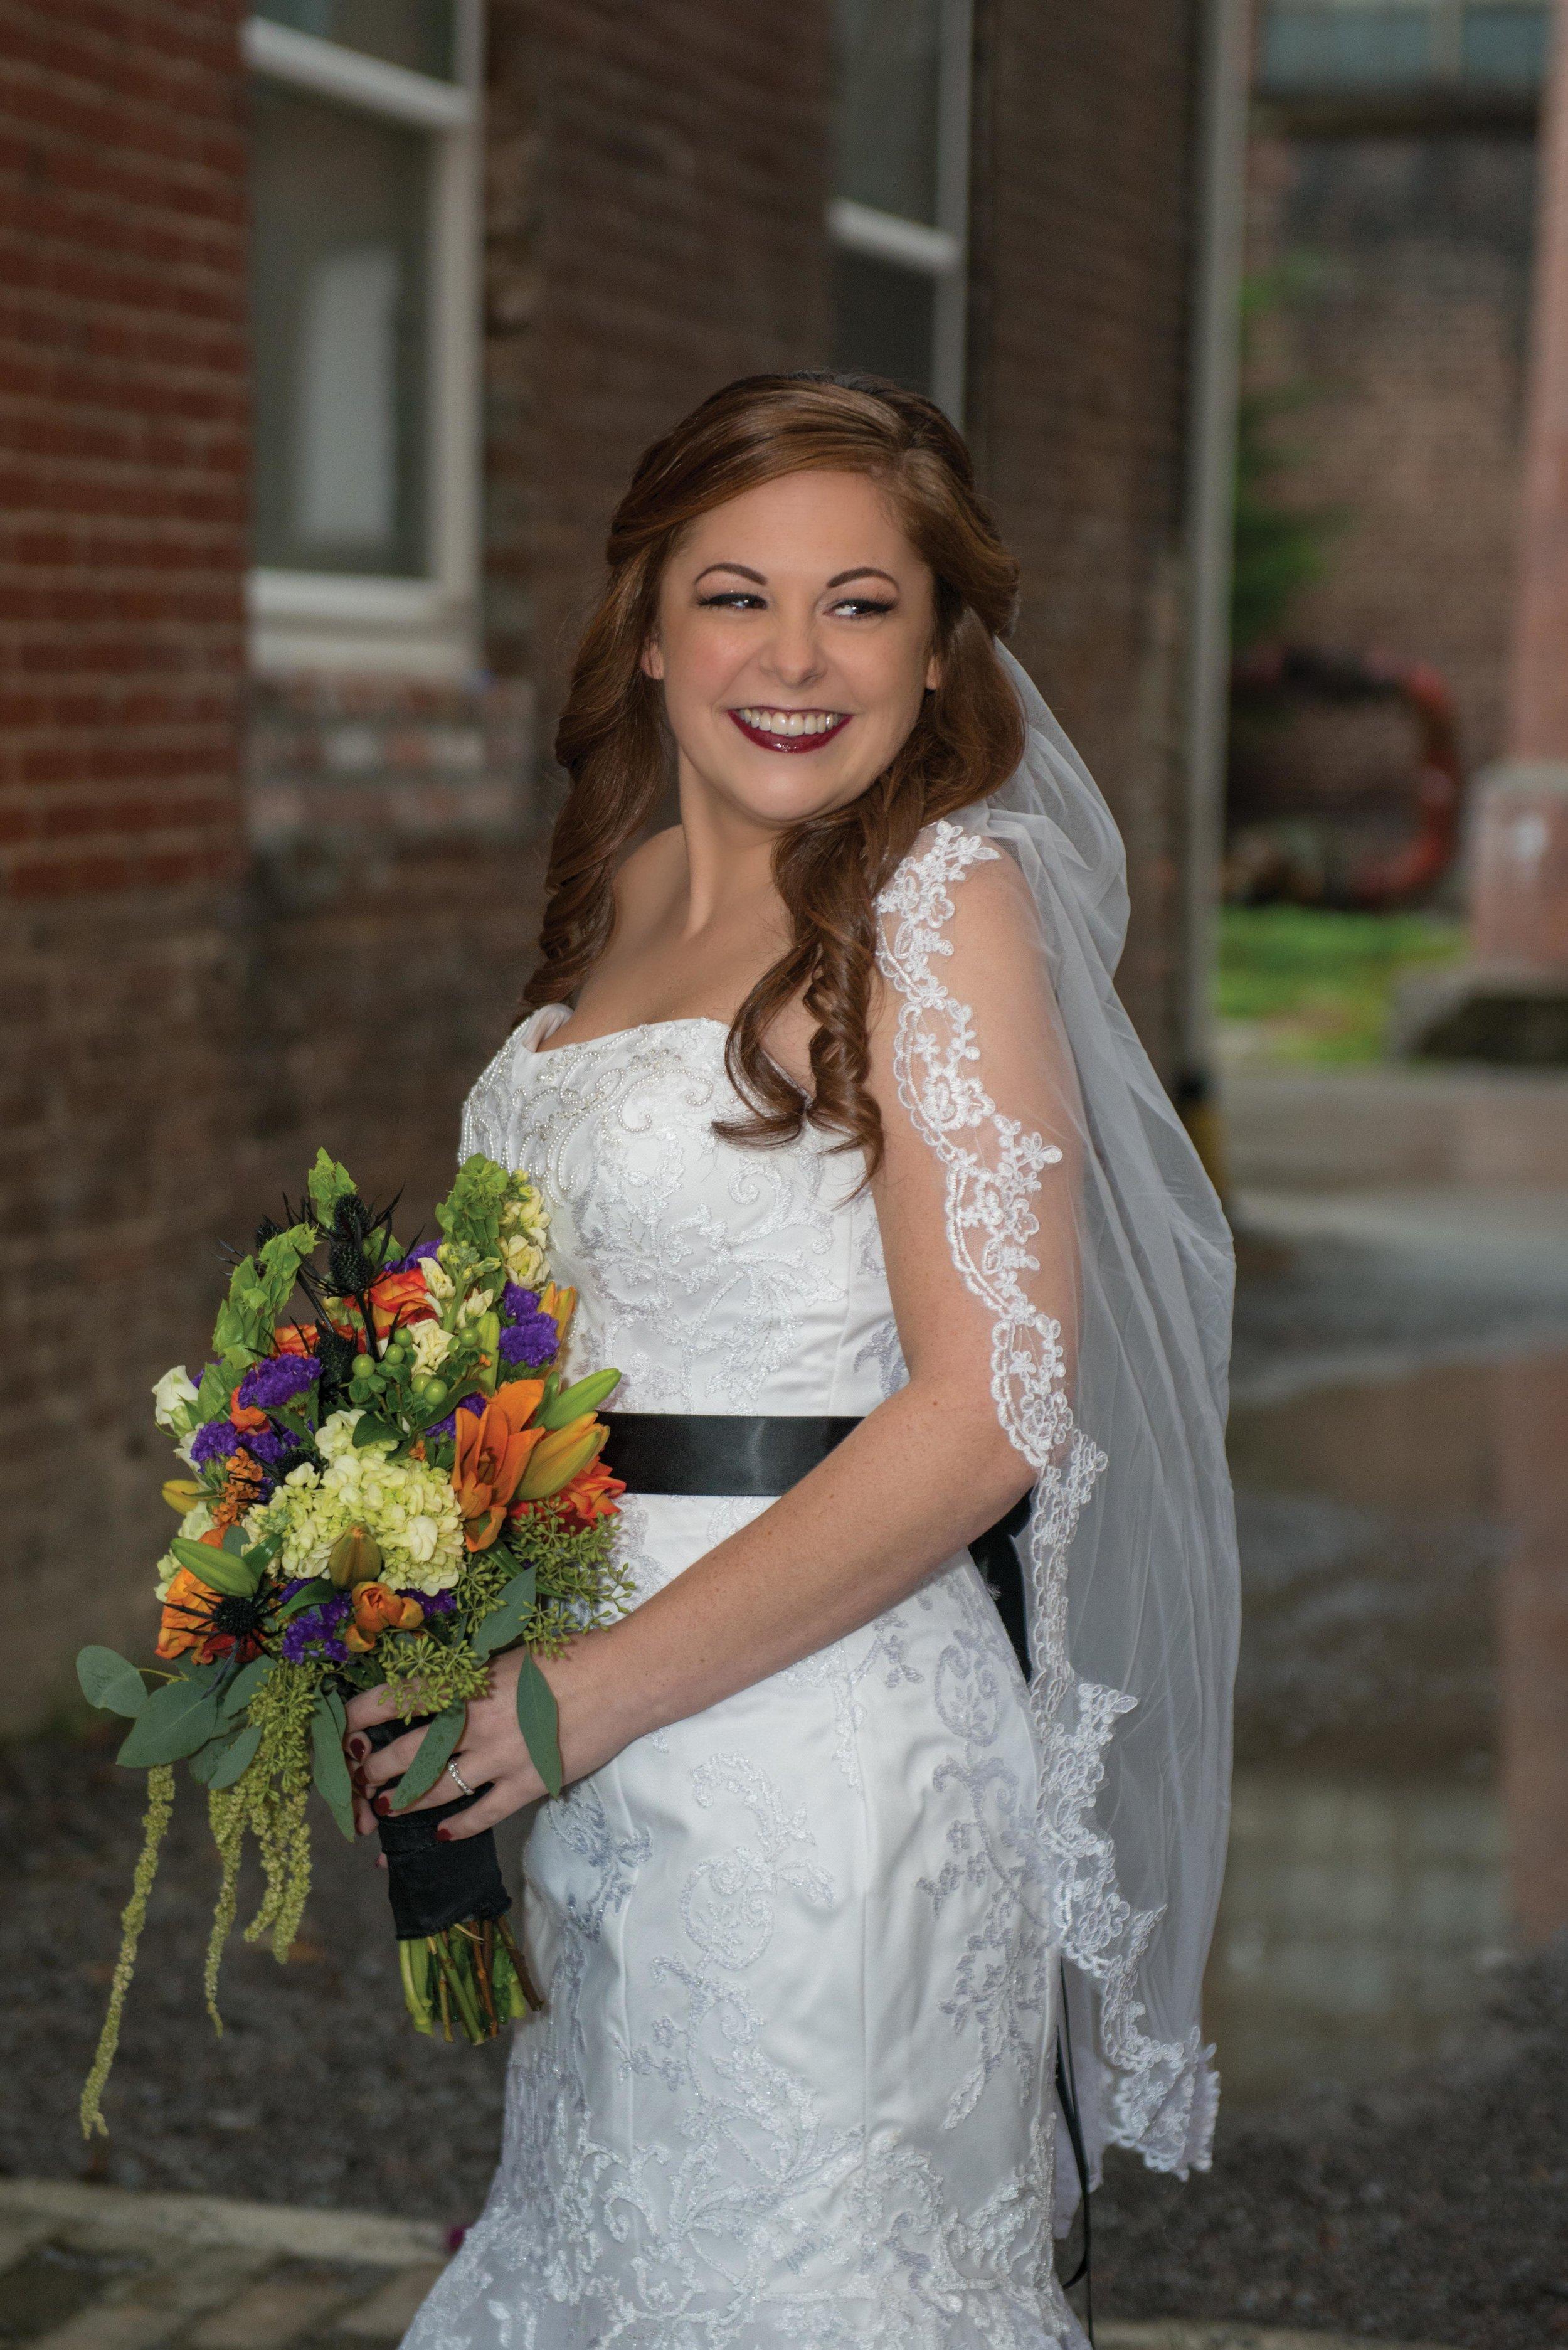 00001_Parker-Wedding-Sp-19.jpg